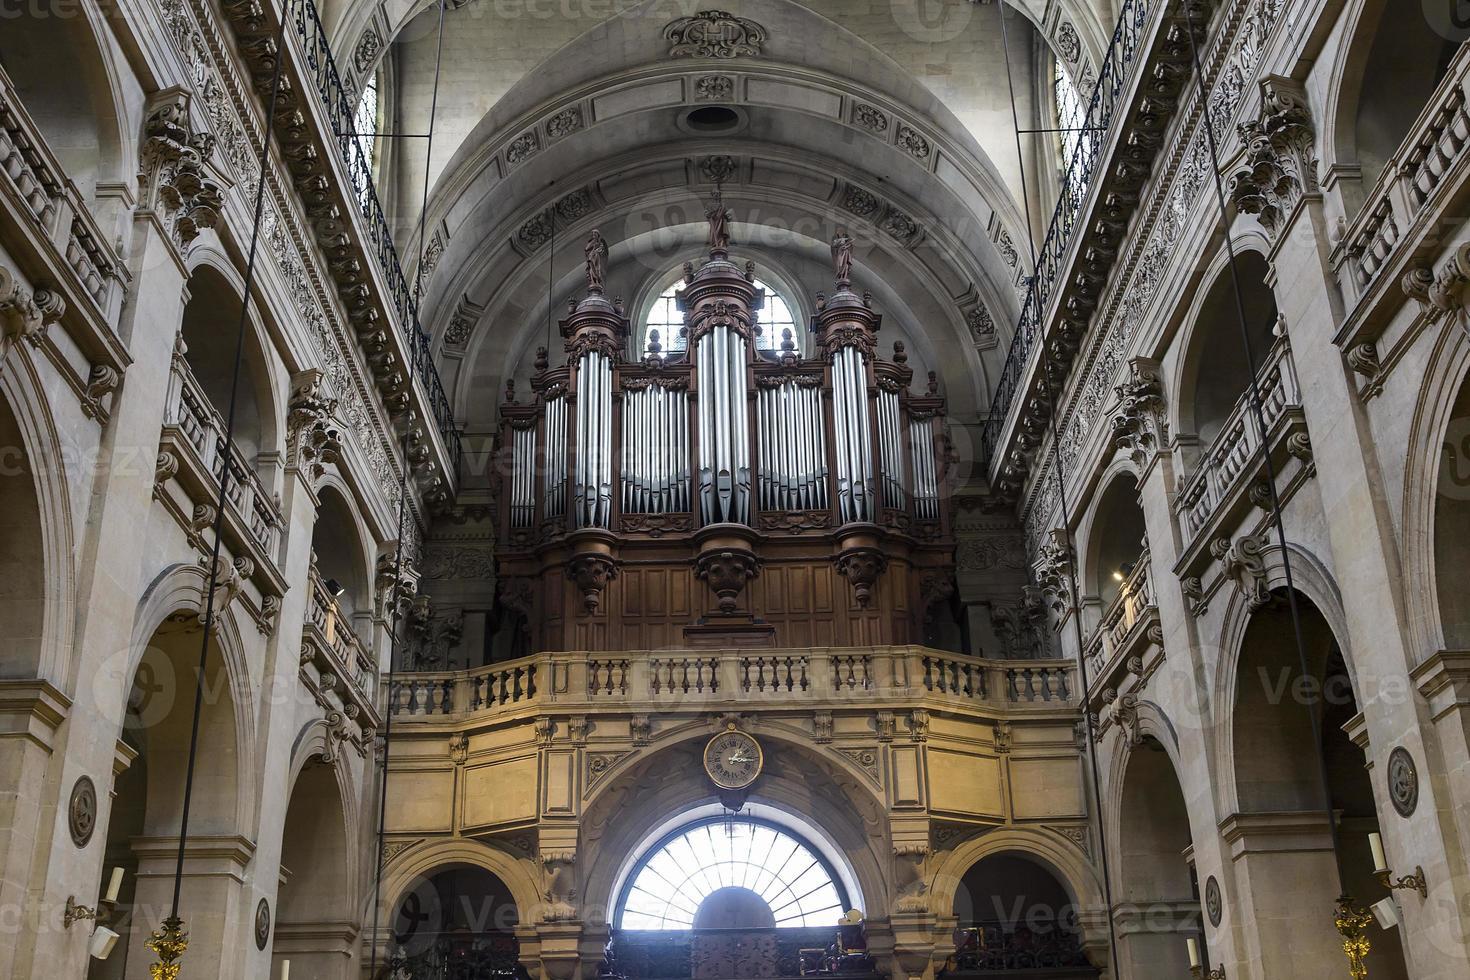 chiesa di saint-paul saint-louis, parigi, francia foto